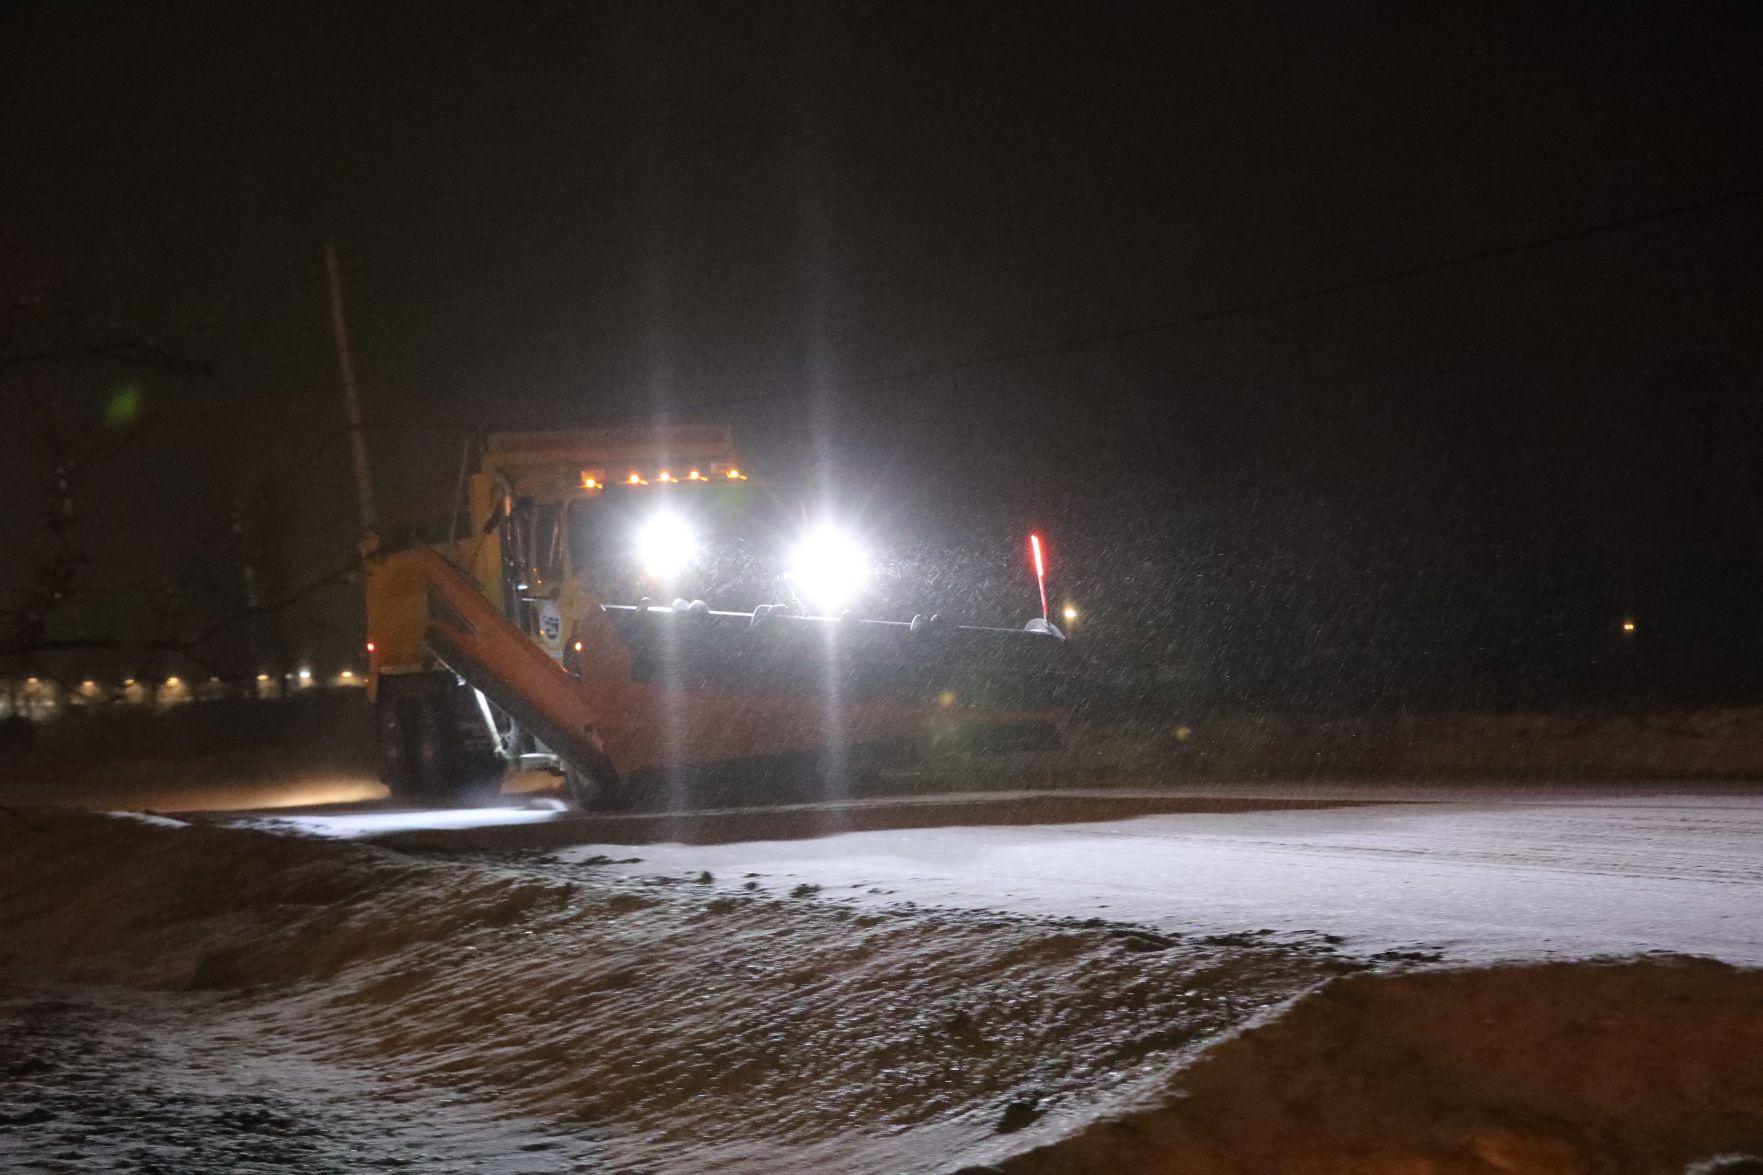 Naughty cops plowing